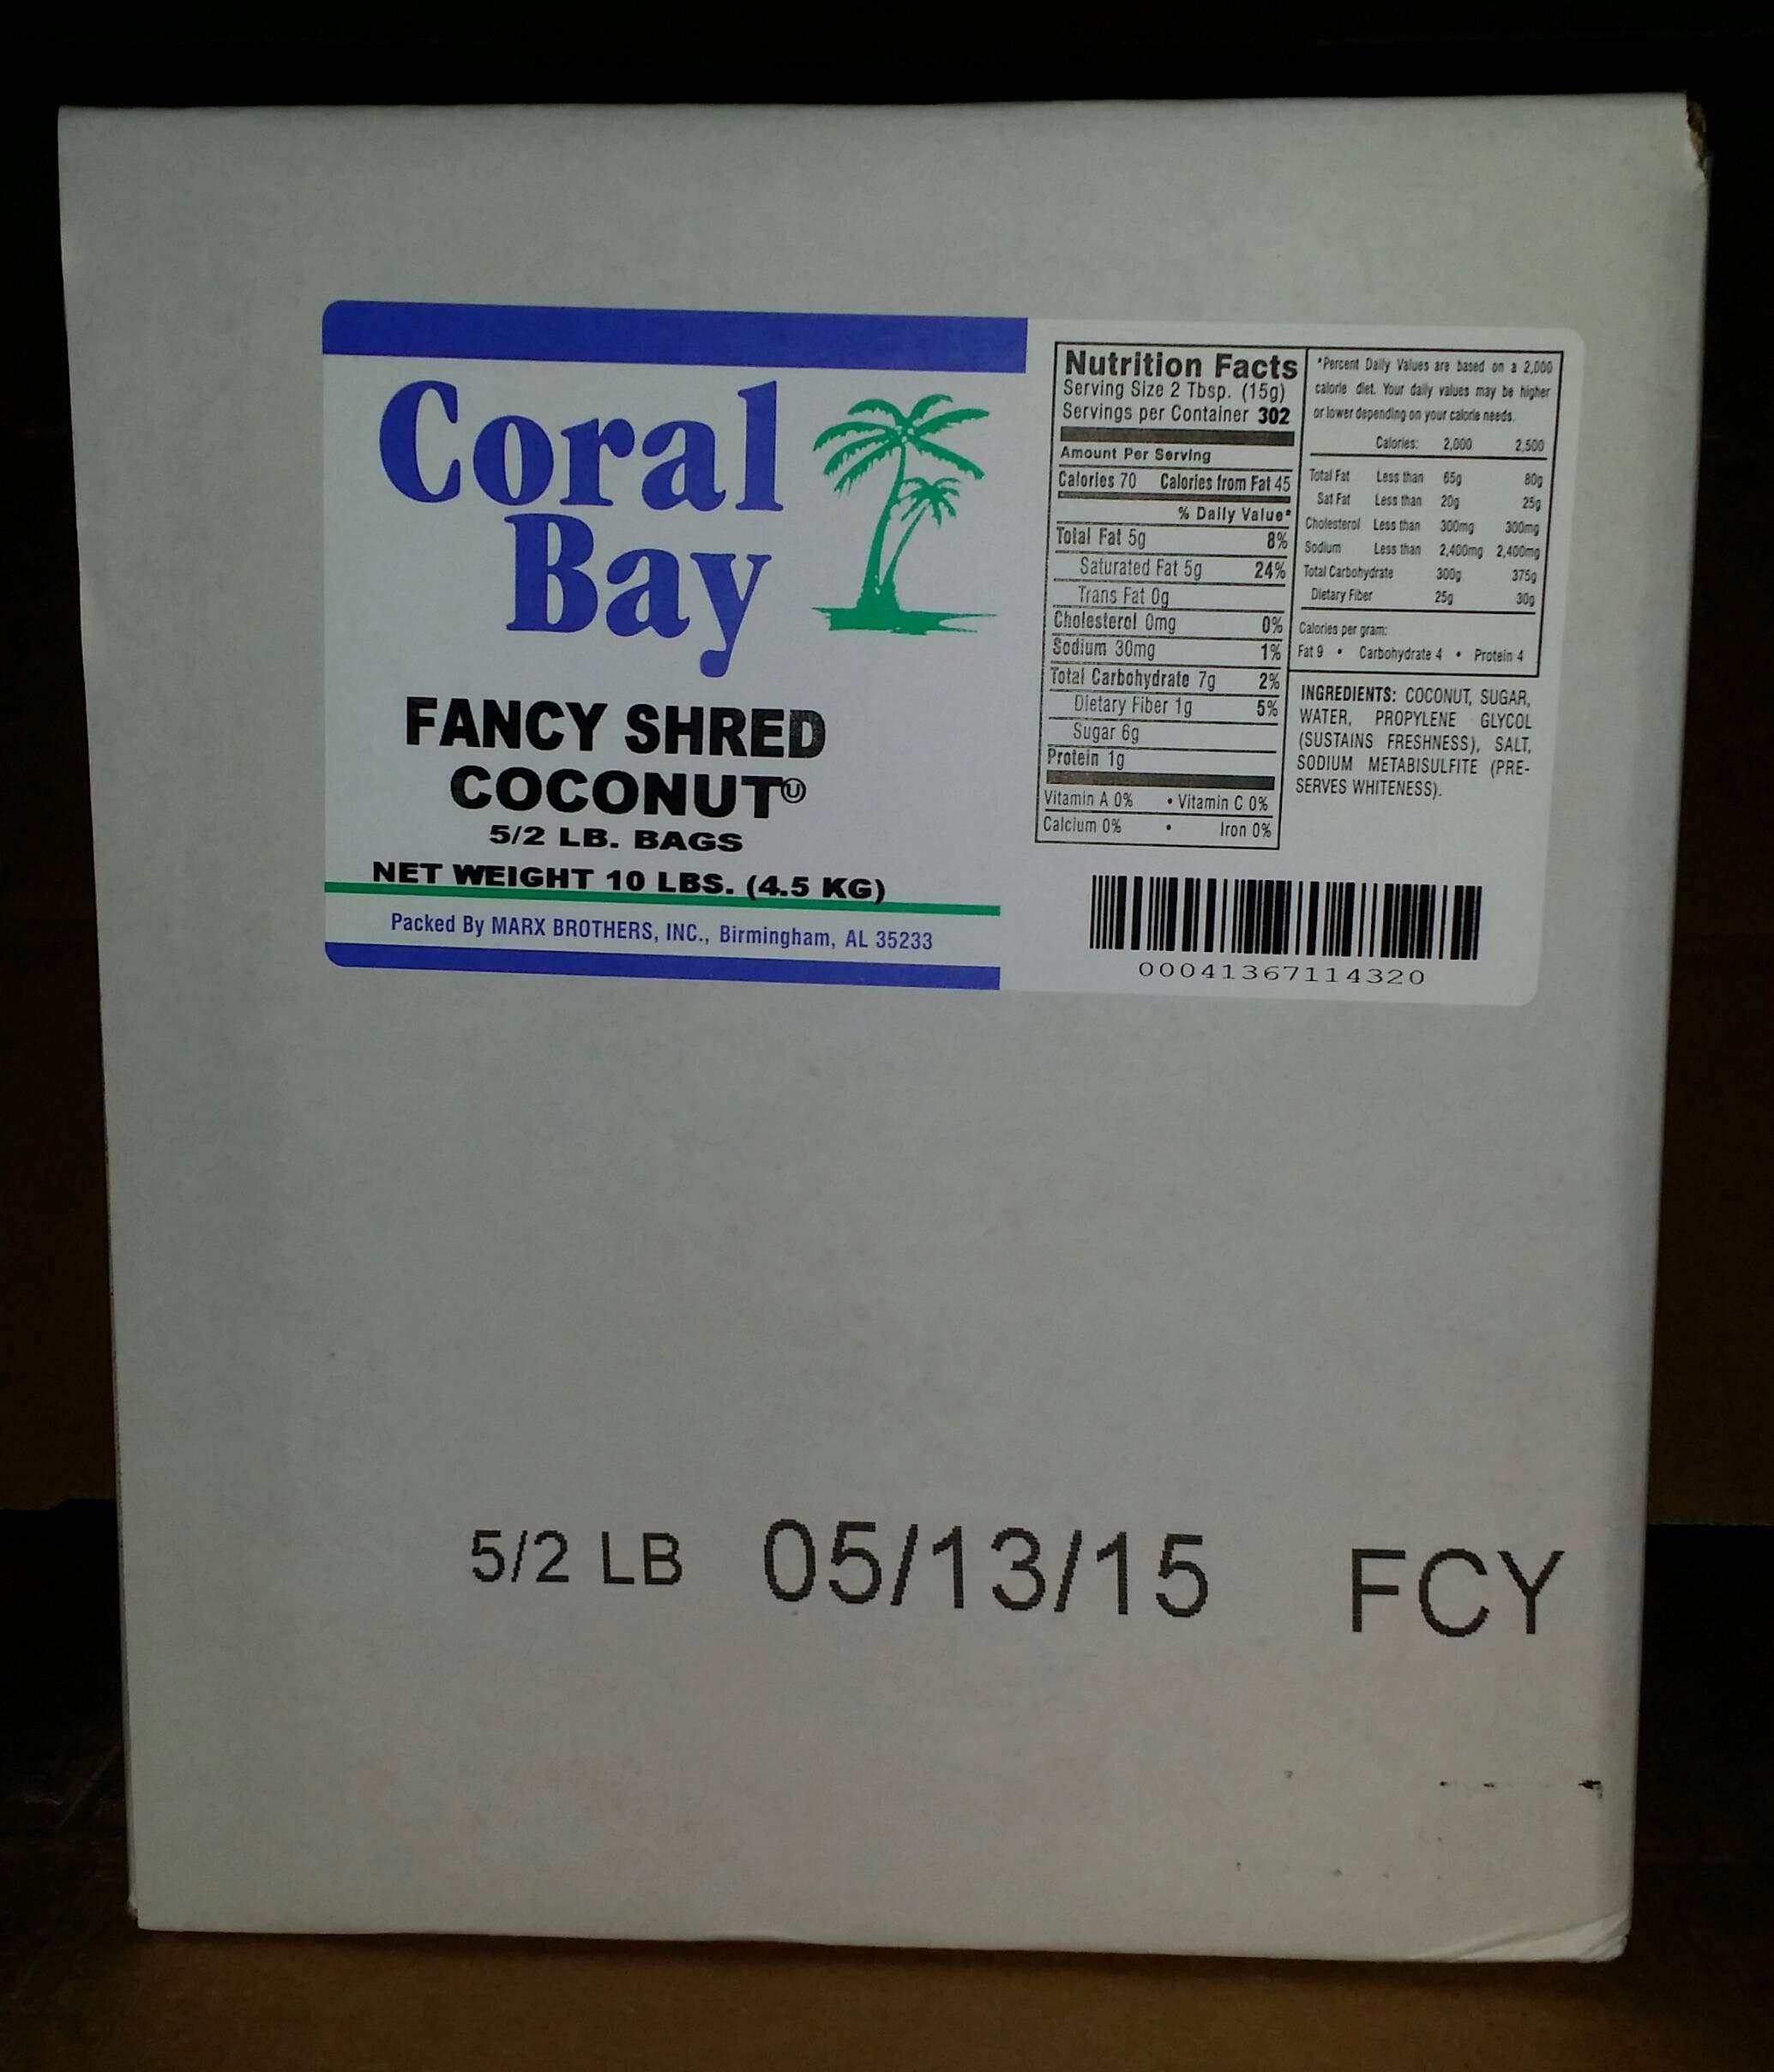 MarxCoconut Coral Bay Fancy Long Shredded Coconut, 2 Pound - 5 per case.